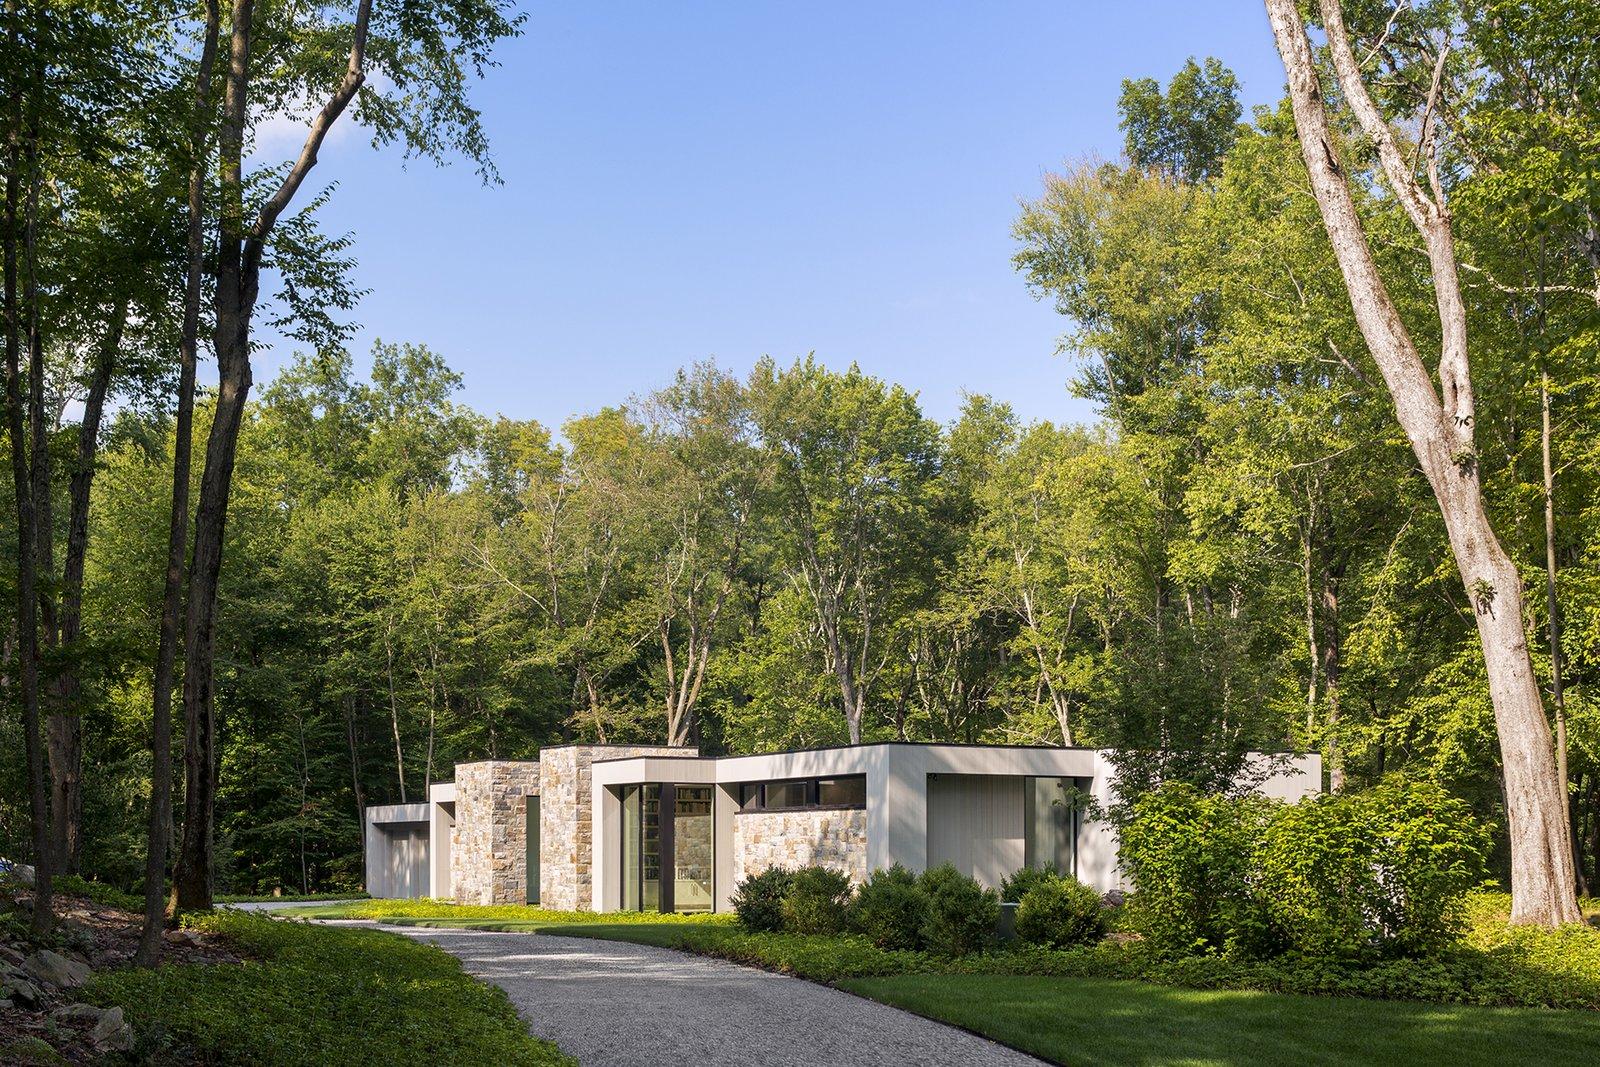 Art House 2.0 Exterior  Art House 2.0 by Carol Kurth Architecture